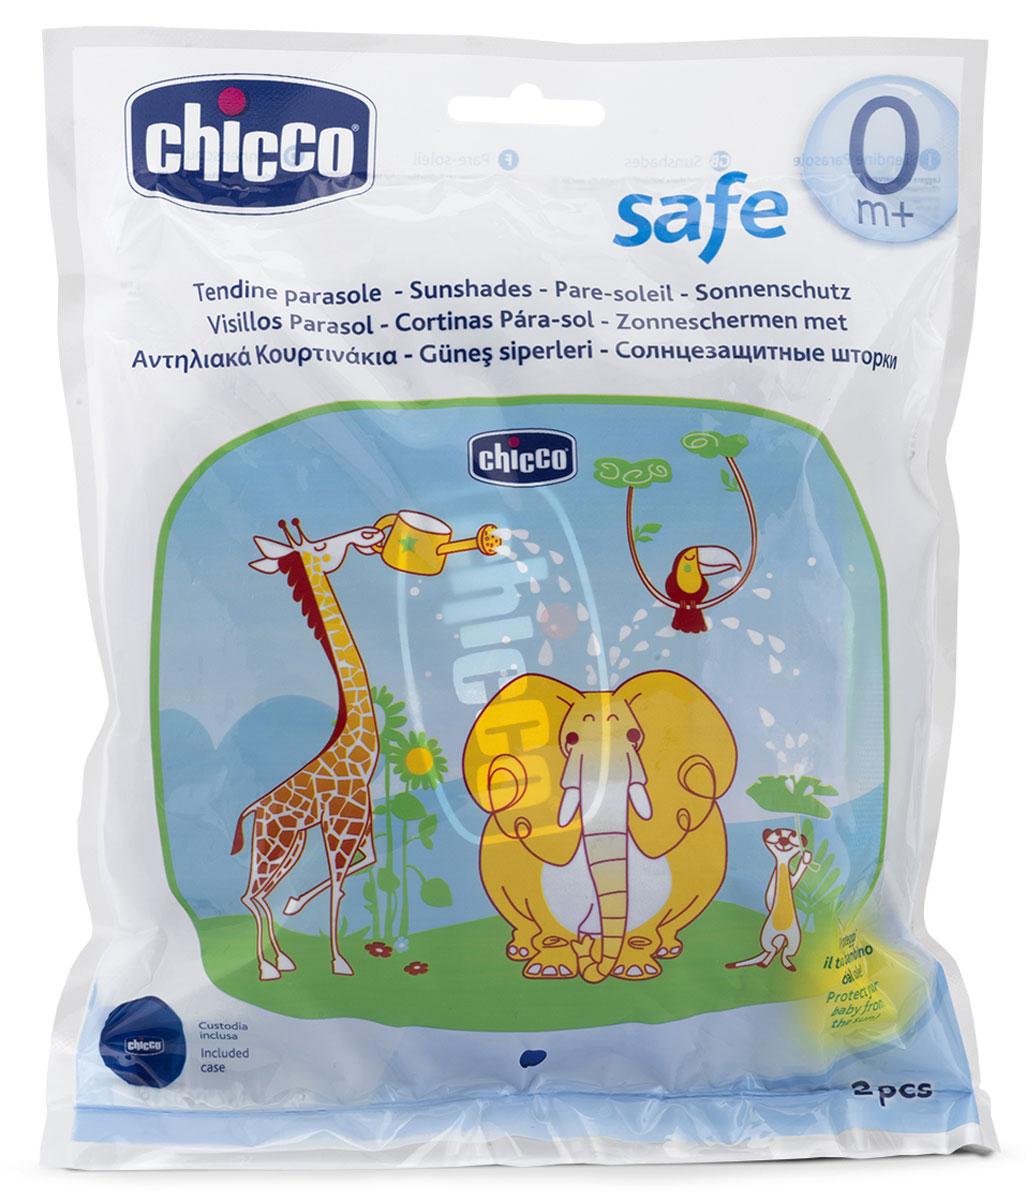 Chicco Солнцезащитная шторка для автомобиля 2 шт ( 3196000000 )